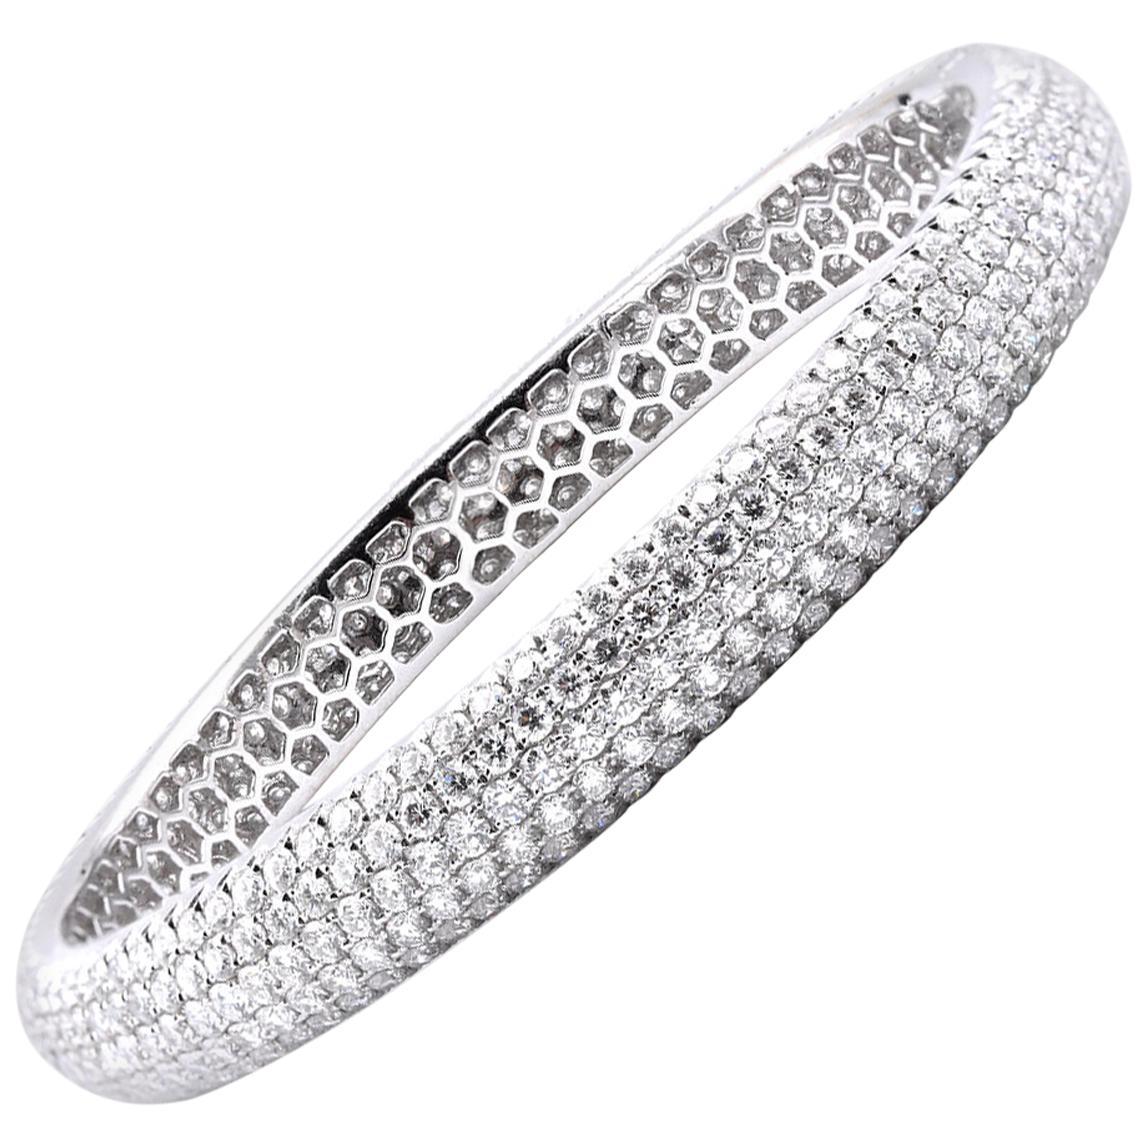 18 Karat White Gold Pave Diamond Bangle Bracelet